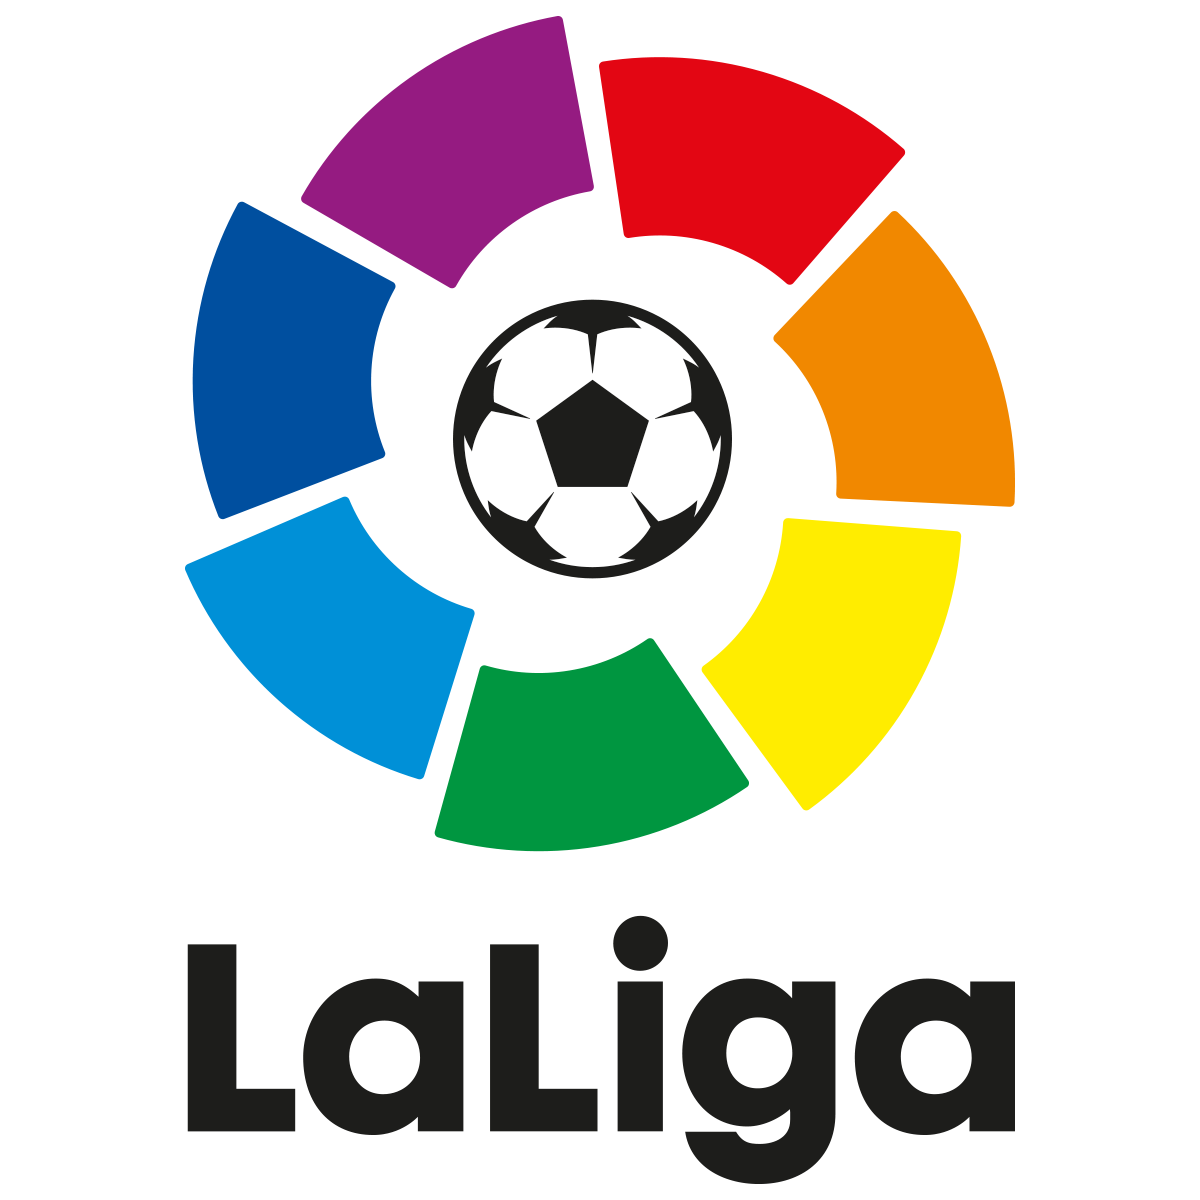 Španielska liga